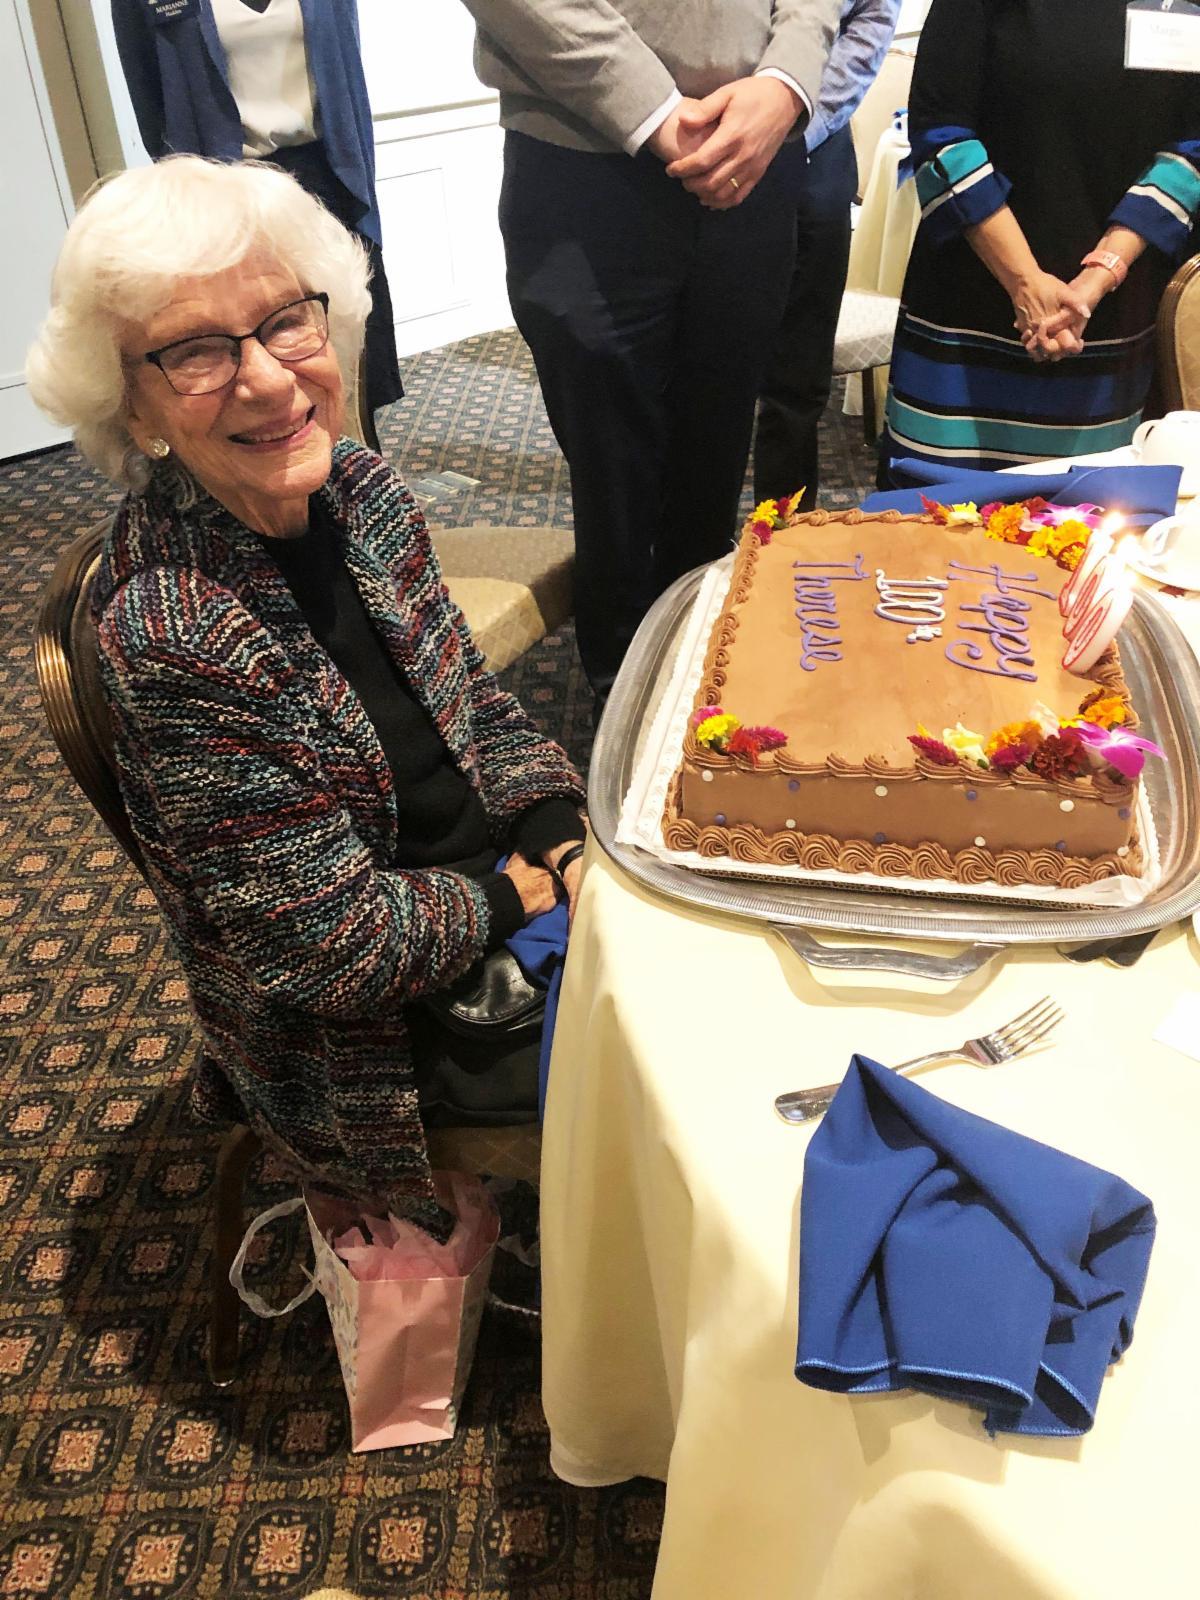 berg with birthday cake